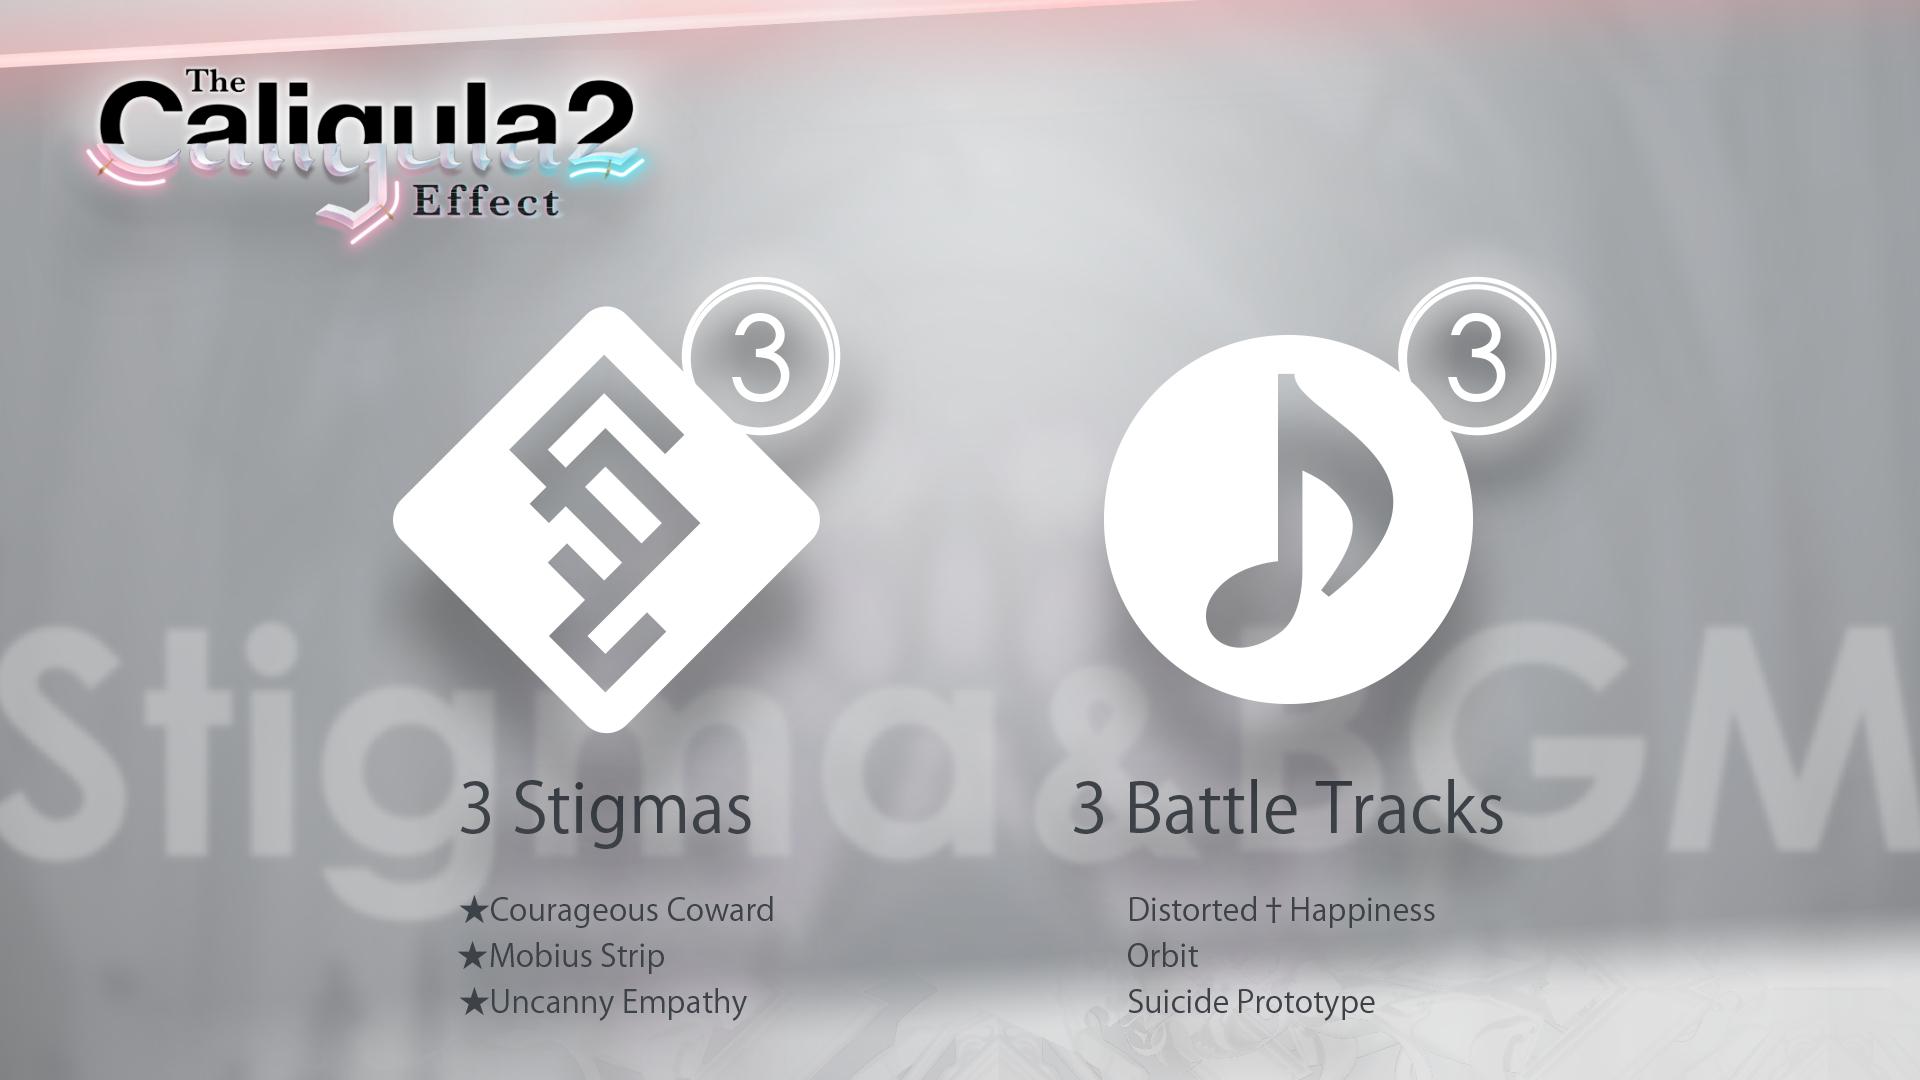 3 Stigmas & 3 Battle Tracks